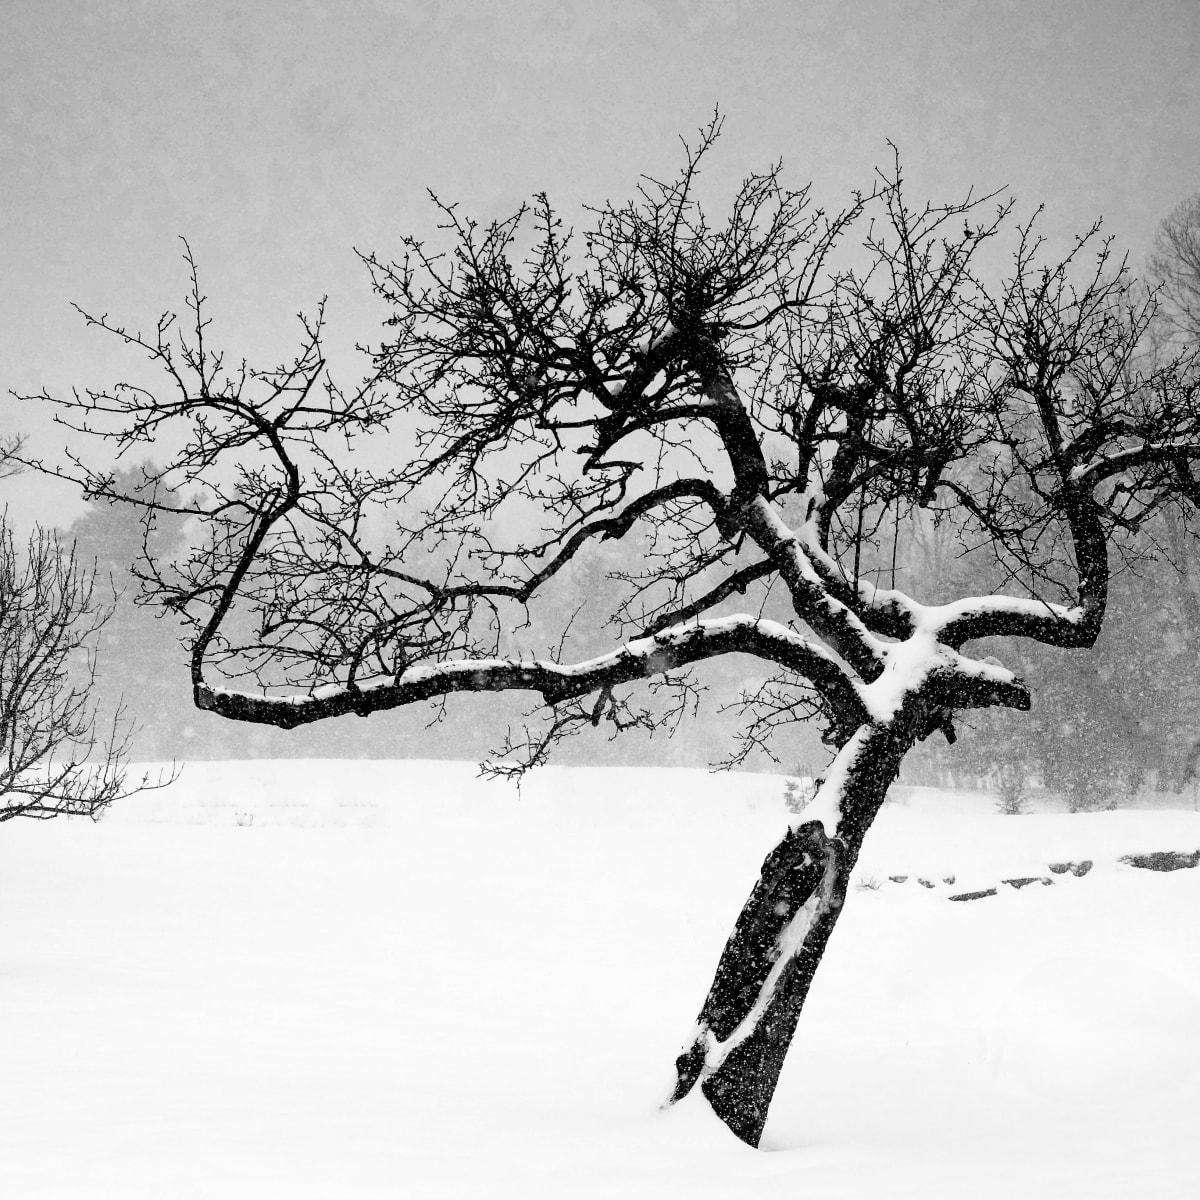 winter crone by Kelly Sinclair